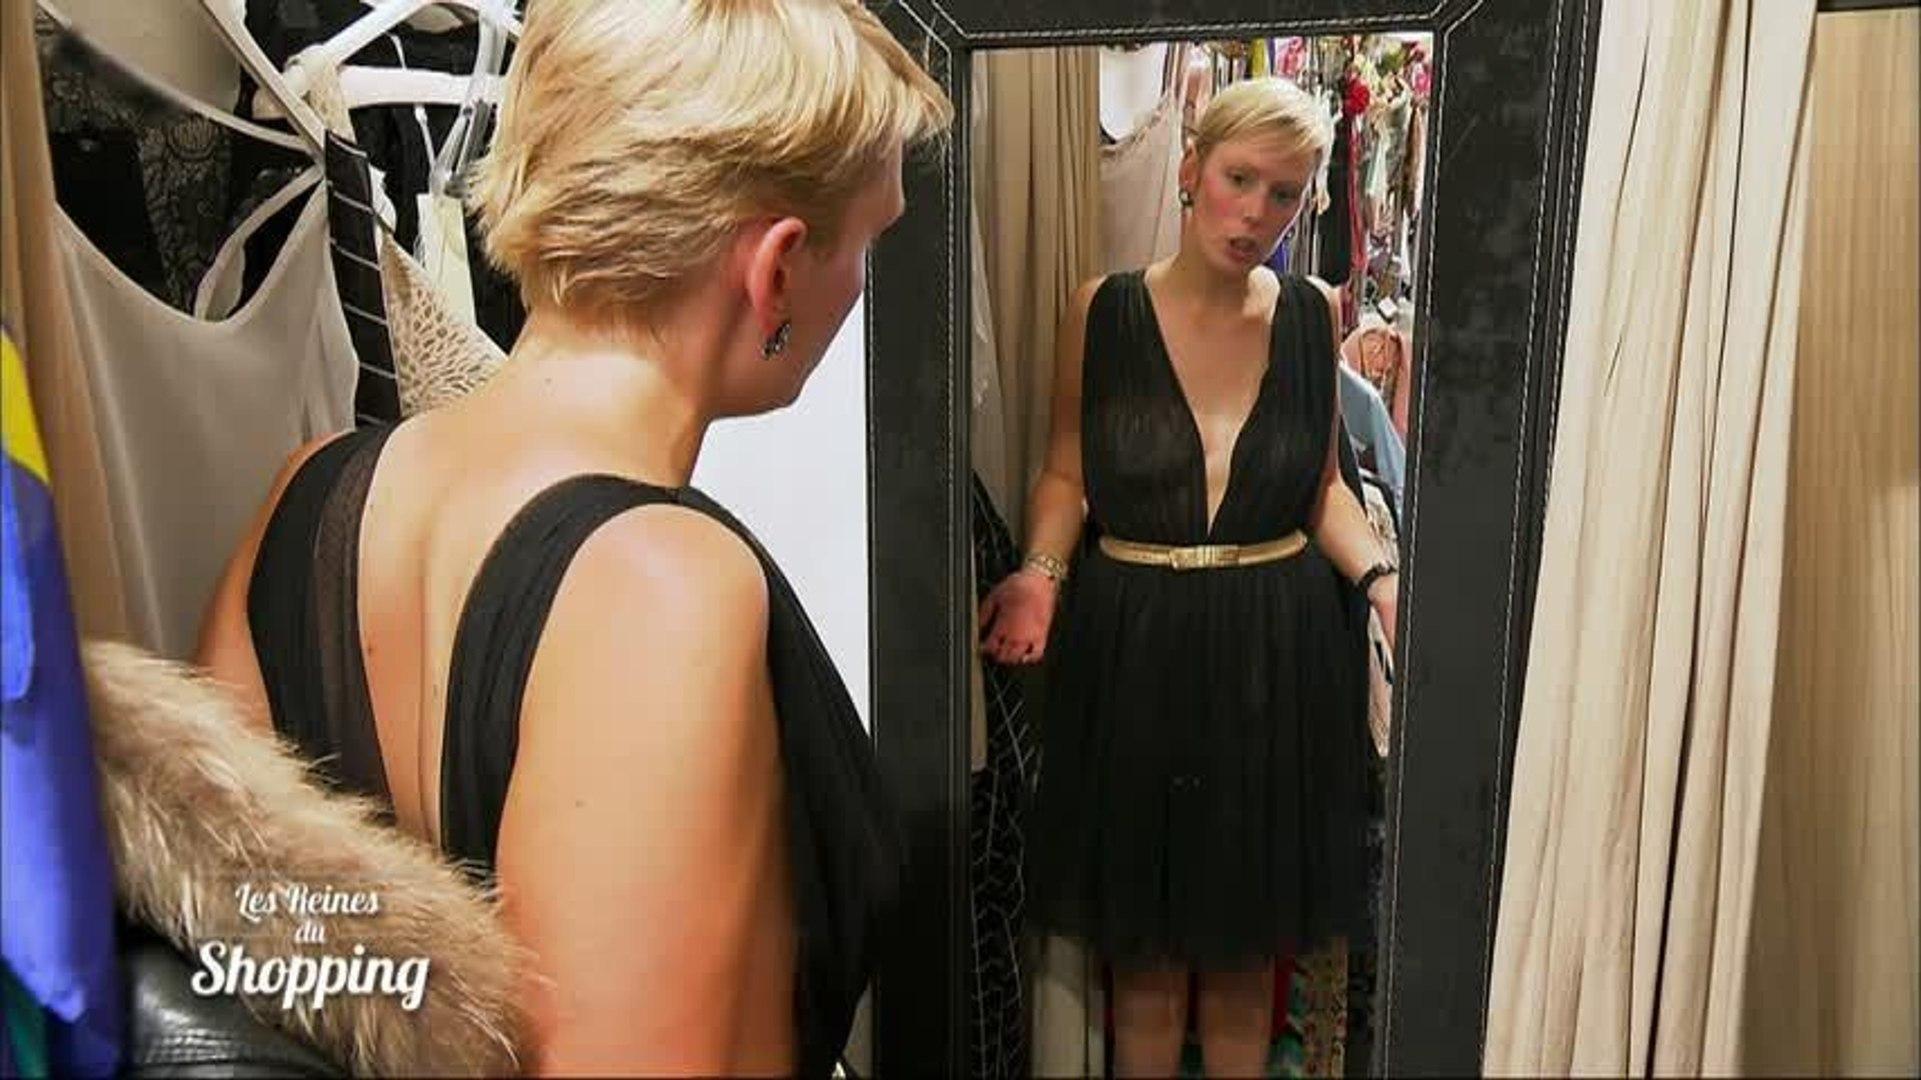 transparente vestido completamente prueba un ¡Audrey SUzpMV